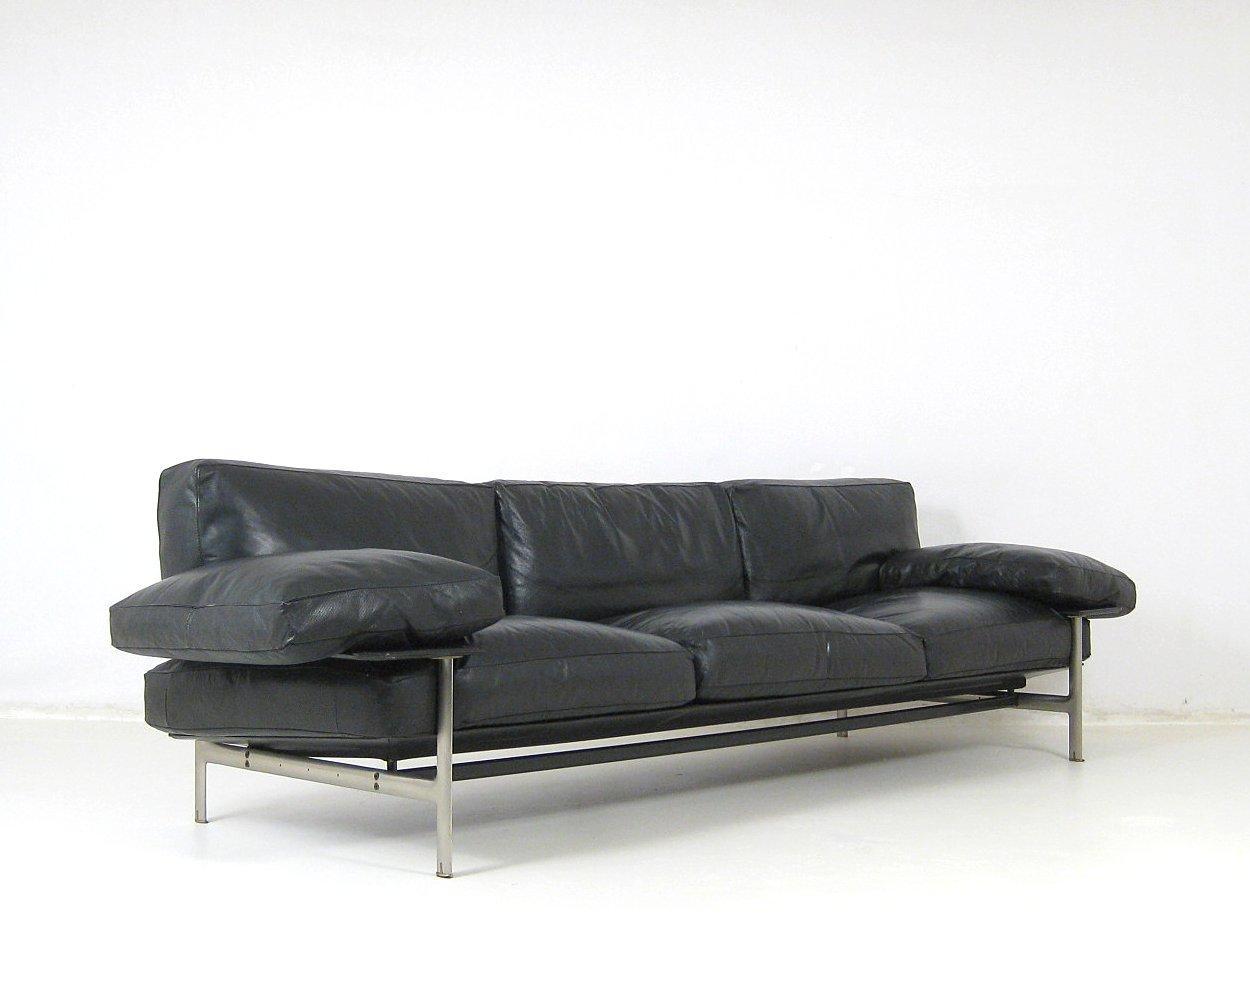 Bemerkenswert Loungeset Toronto Referenz Von Elegant Free Antonio Citterio Paolo Nava Lounge